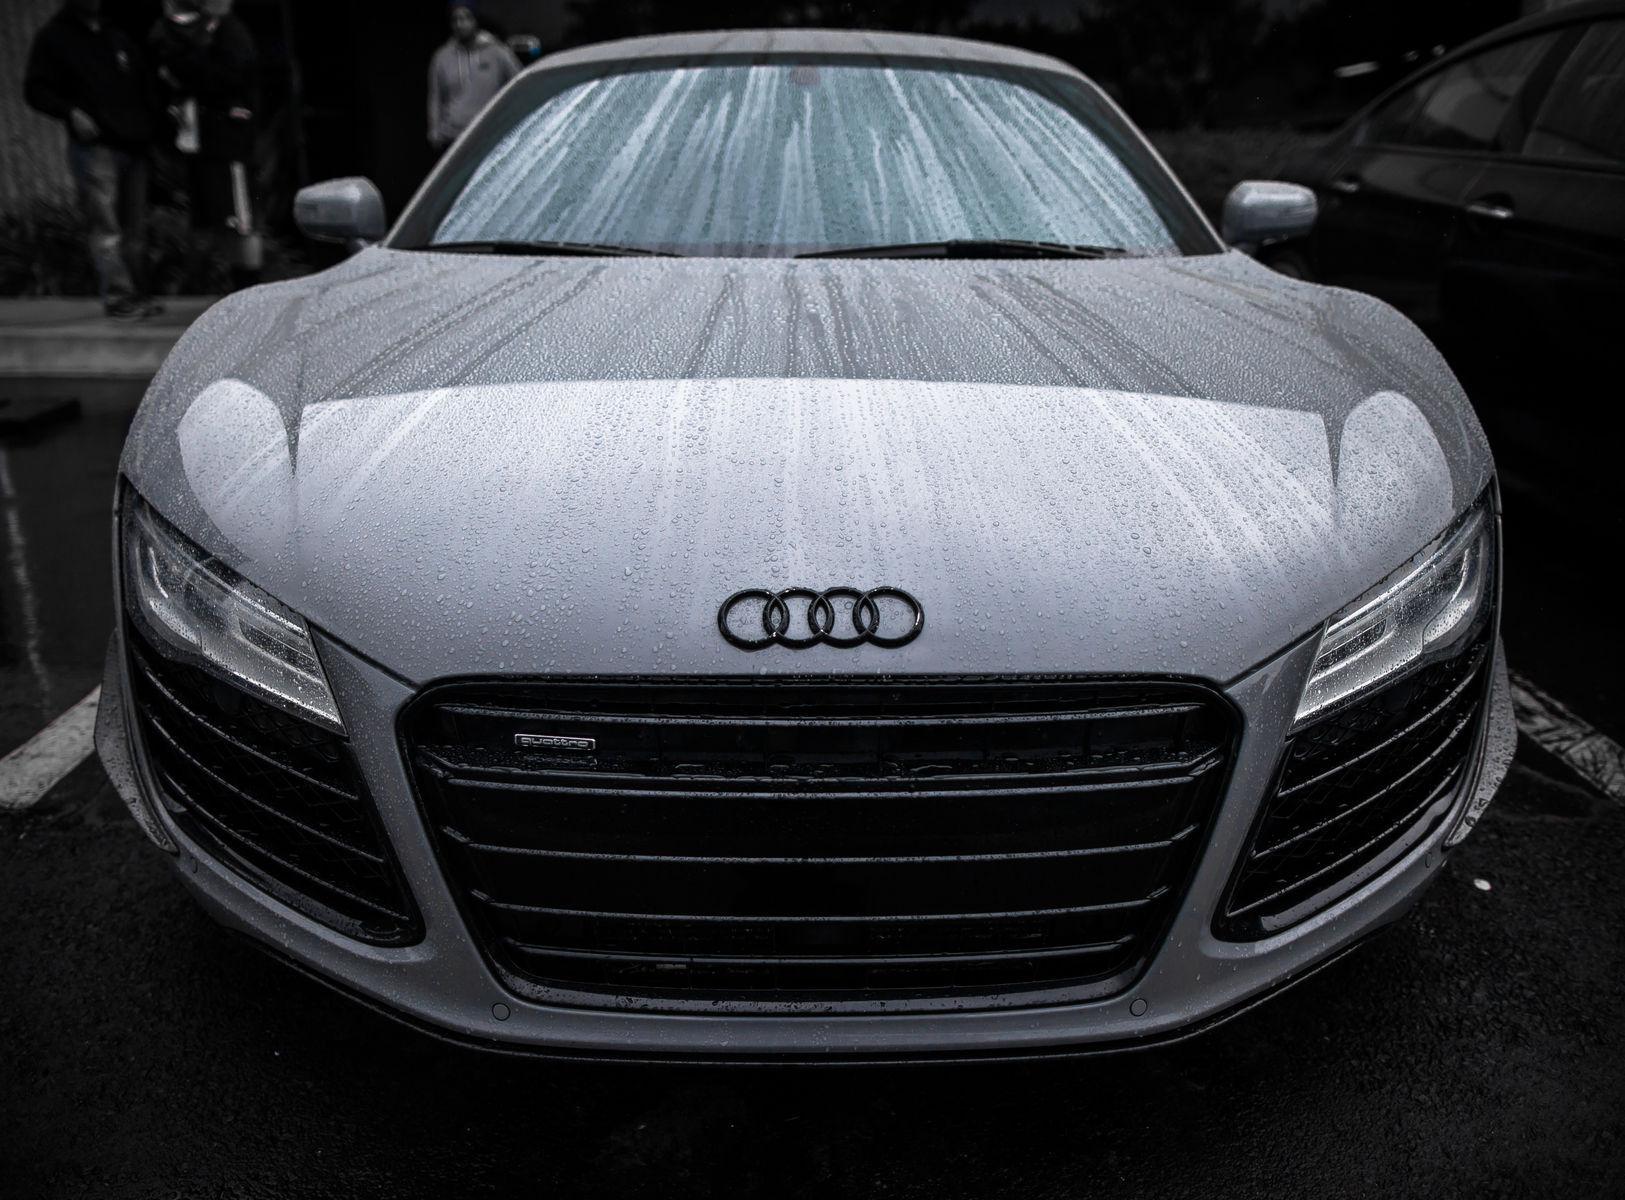 2015 Audi R8 | The Auto Salon Grand Opening